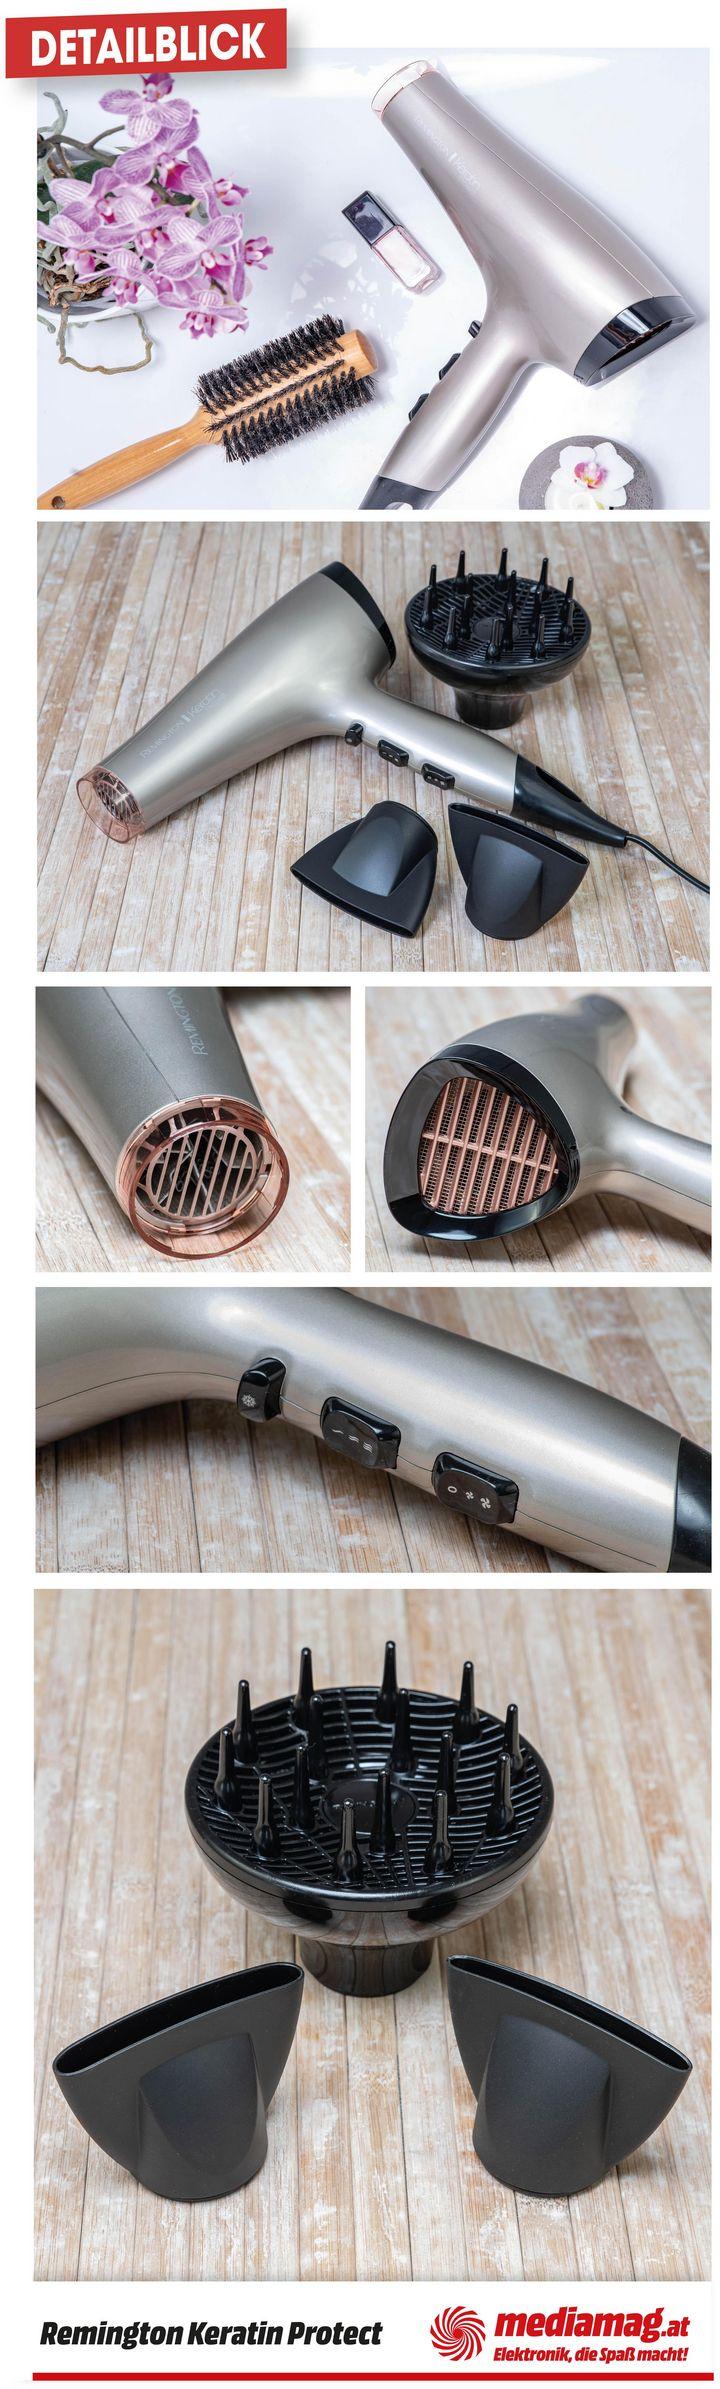 Remington Keratin Protect Haartrockner AC8002: Stylingdüsen, Diffusor und Keratinbeschichtung stylen das Haar schonend.